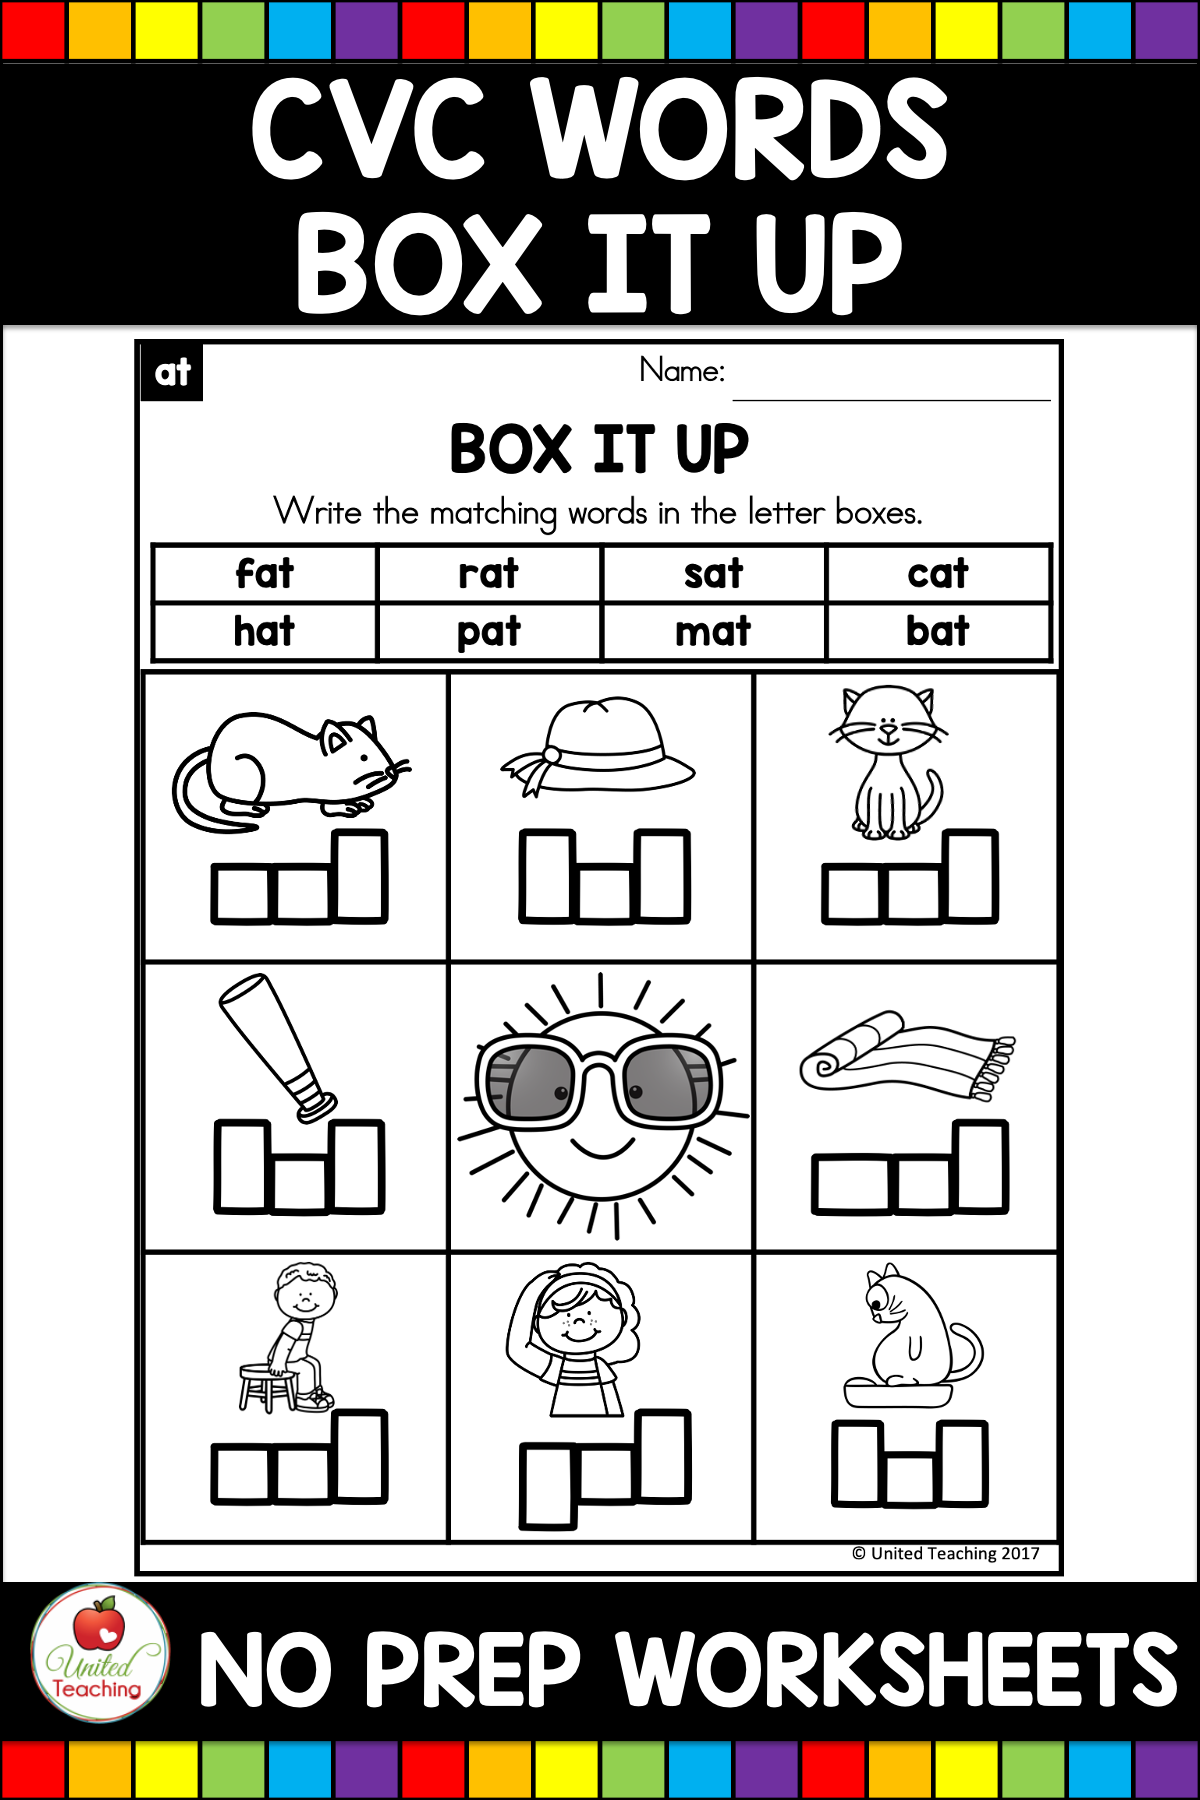 Cvc Words Box It Up United Teaching Cvc Words Writing Cvc Words Cvc Word Activities [ 1800 x 1200 Pixel ]